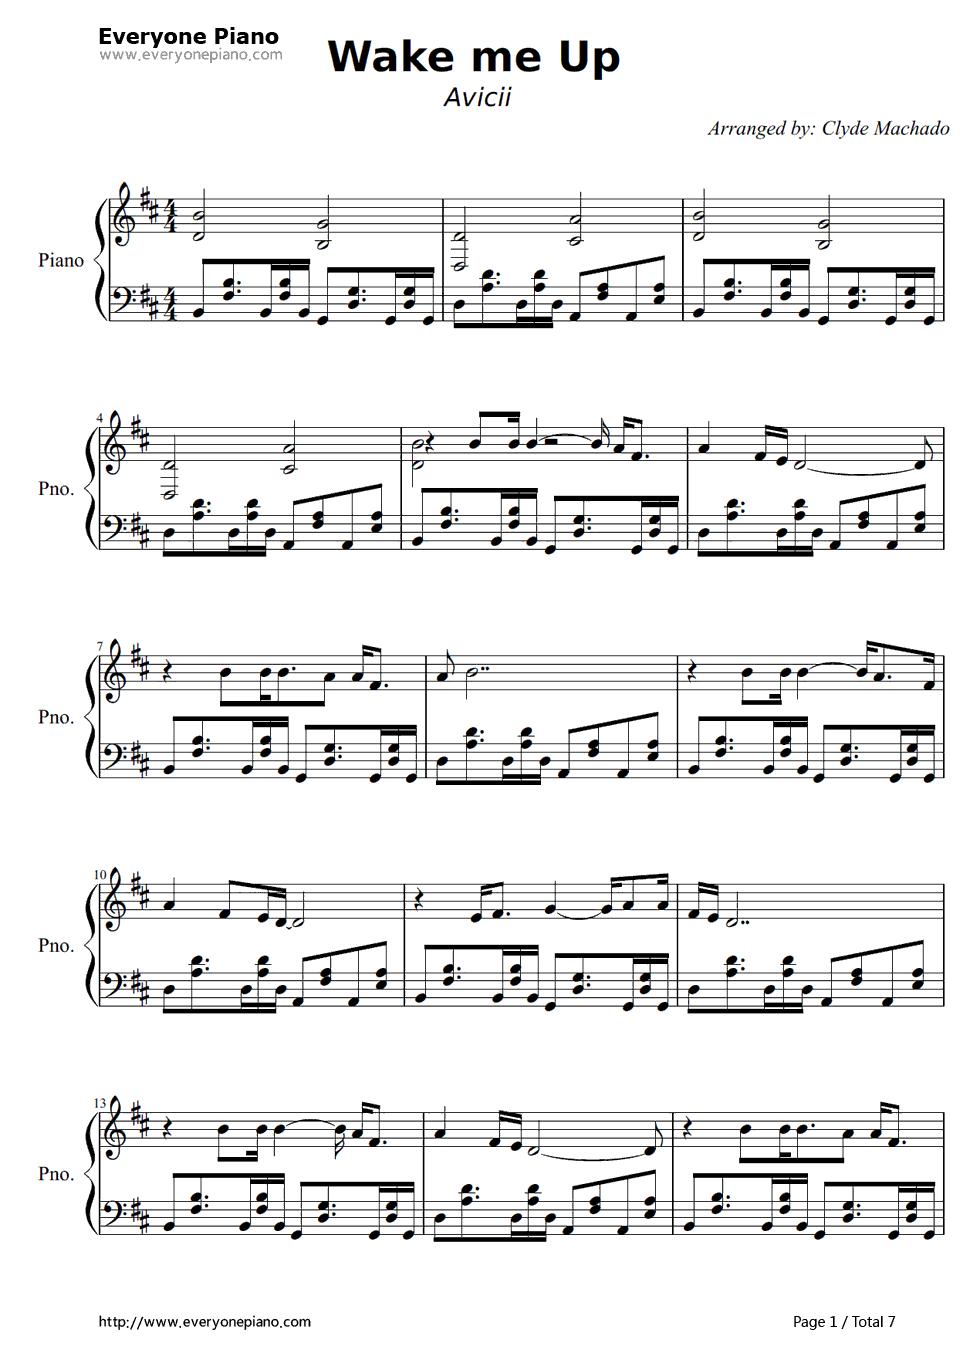 Wake me up avicii stave preview 1 free piano sheet music piano listen now print sheet wake me up avicii stave preview 1 hexwebz Gallery